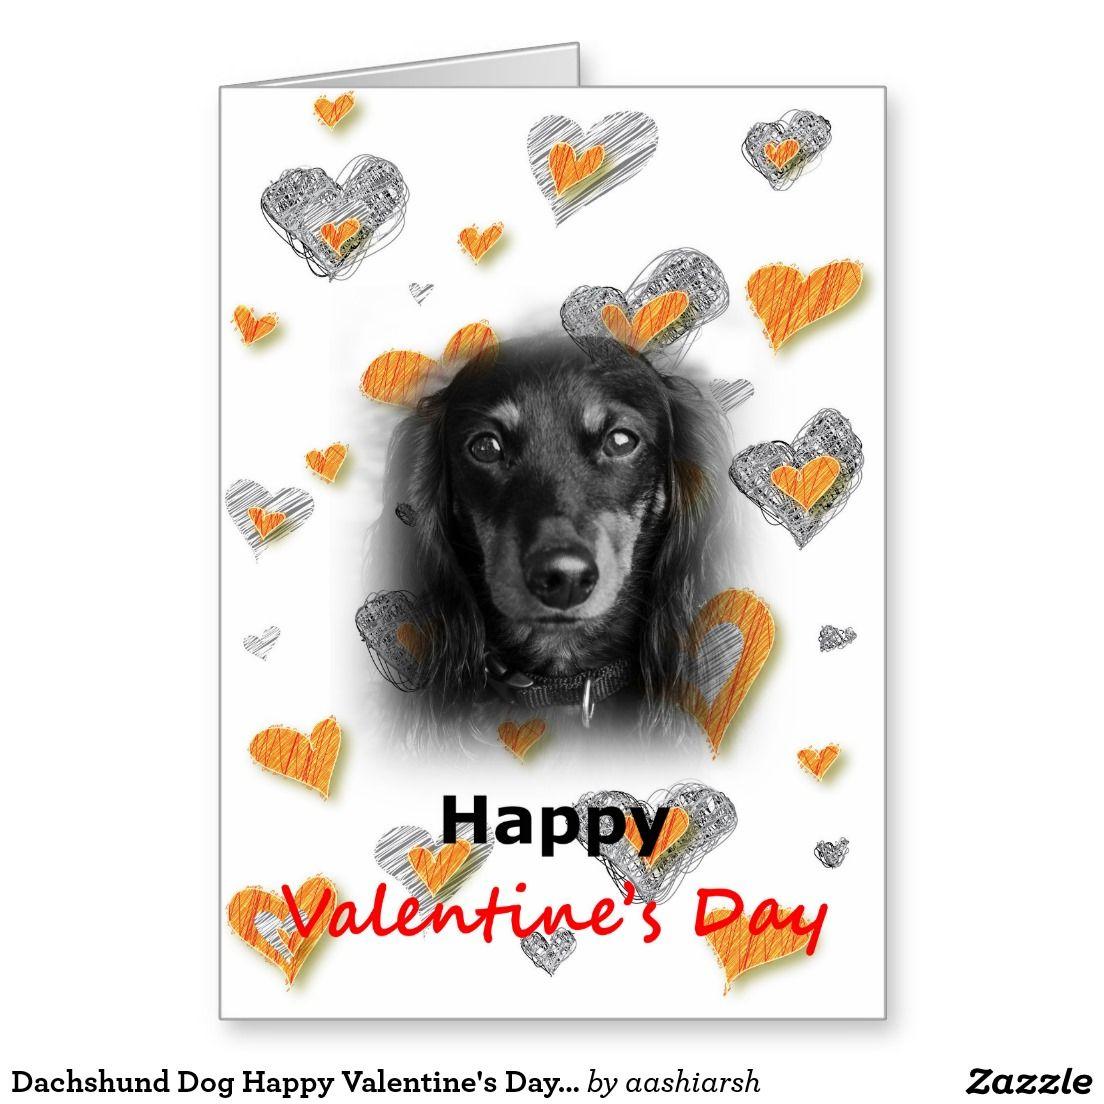 Dachshund dog happy valentines day hearts card zazzle